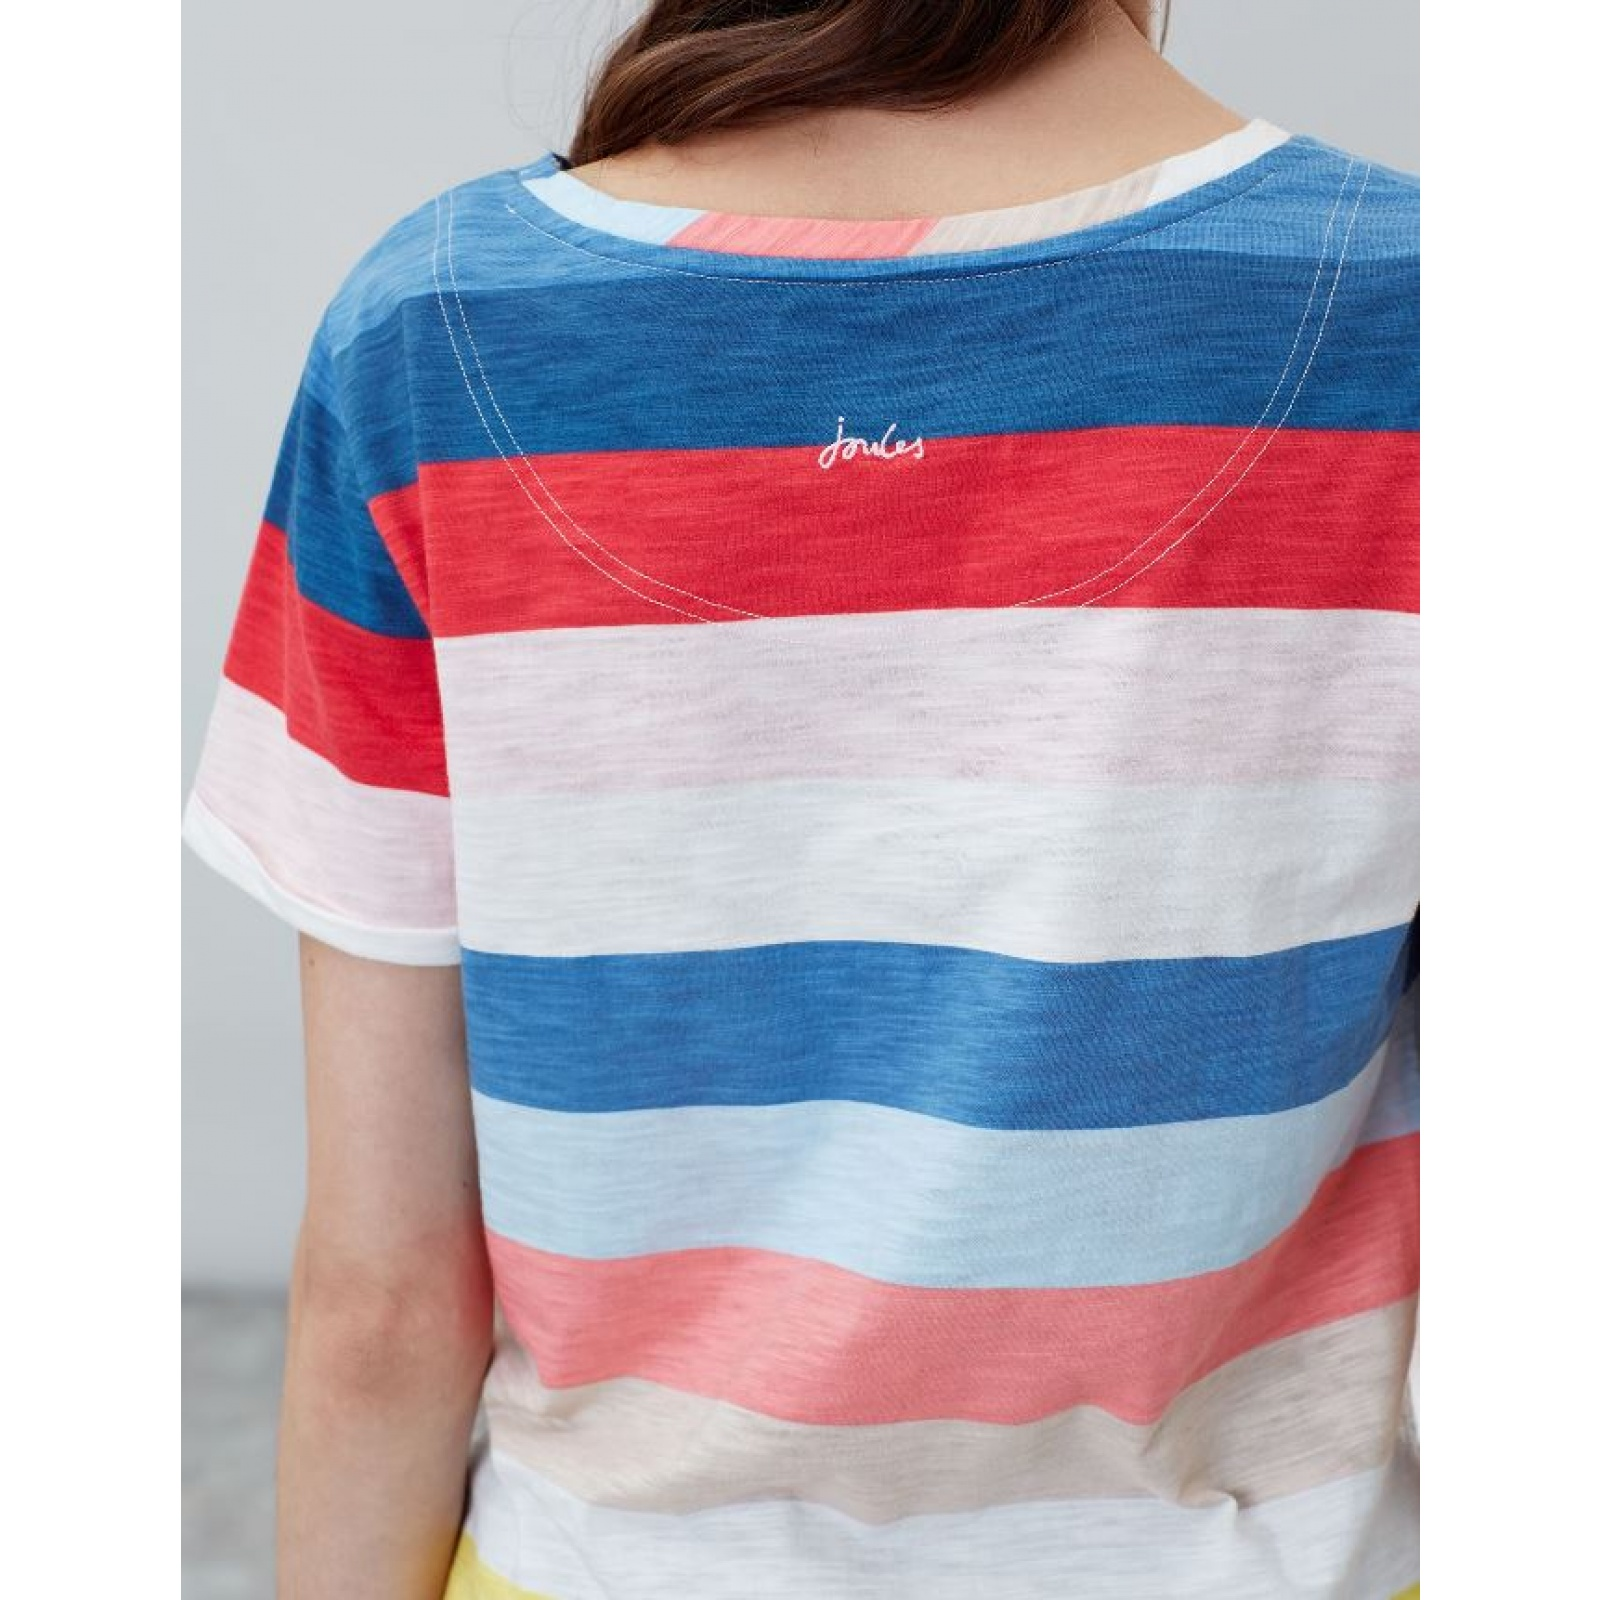 Joules-Nessa-Raya-Ligero-Jersey-Camiseta-SS19 miniatura 4